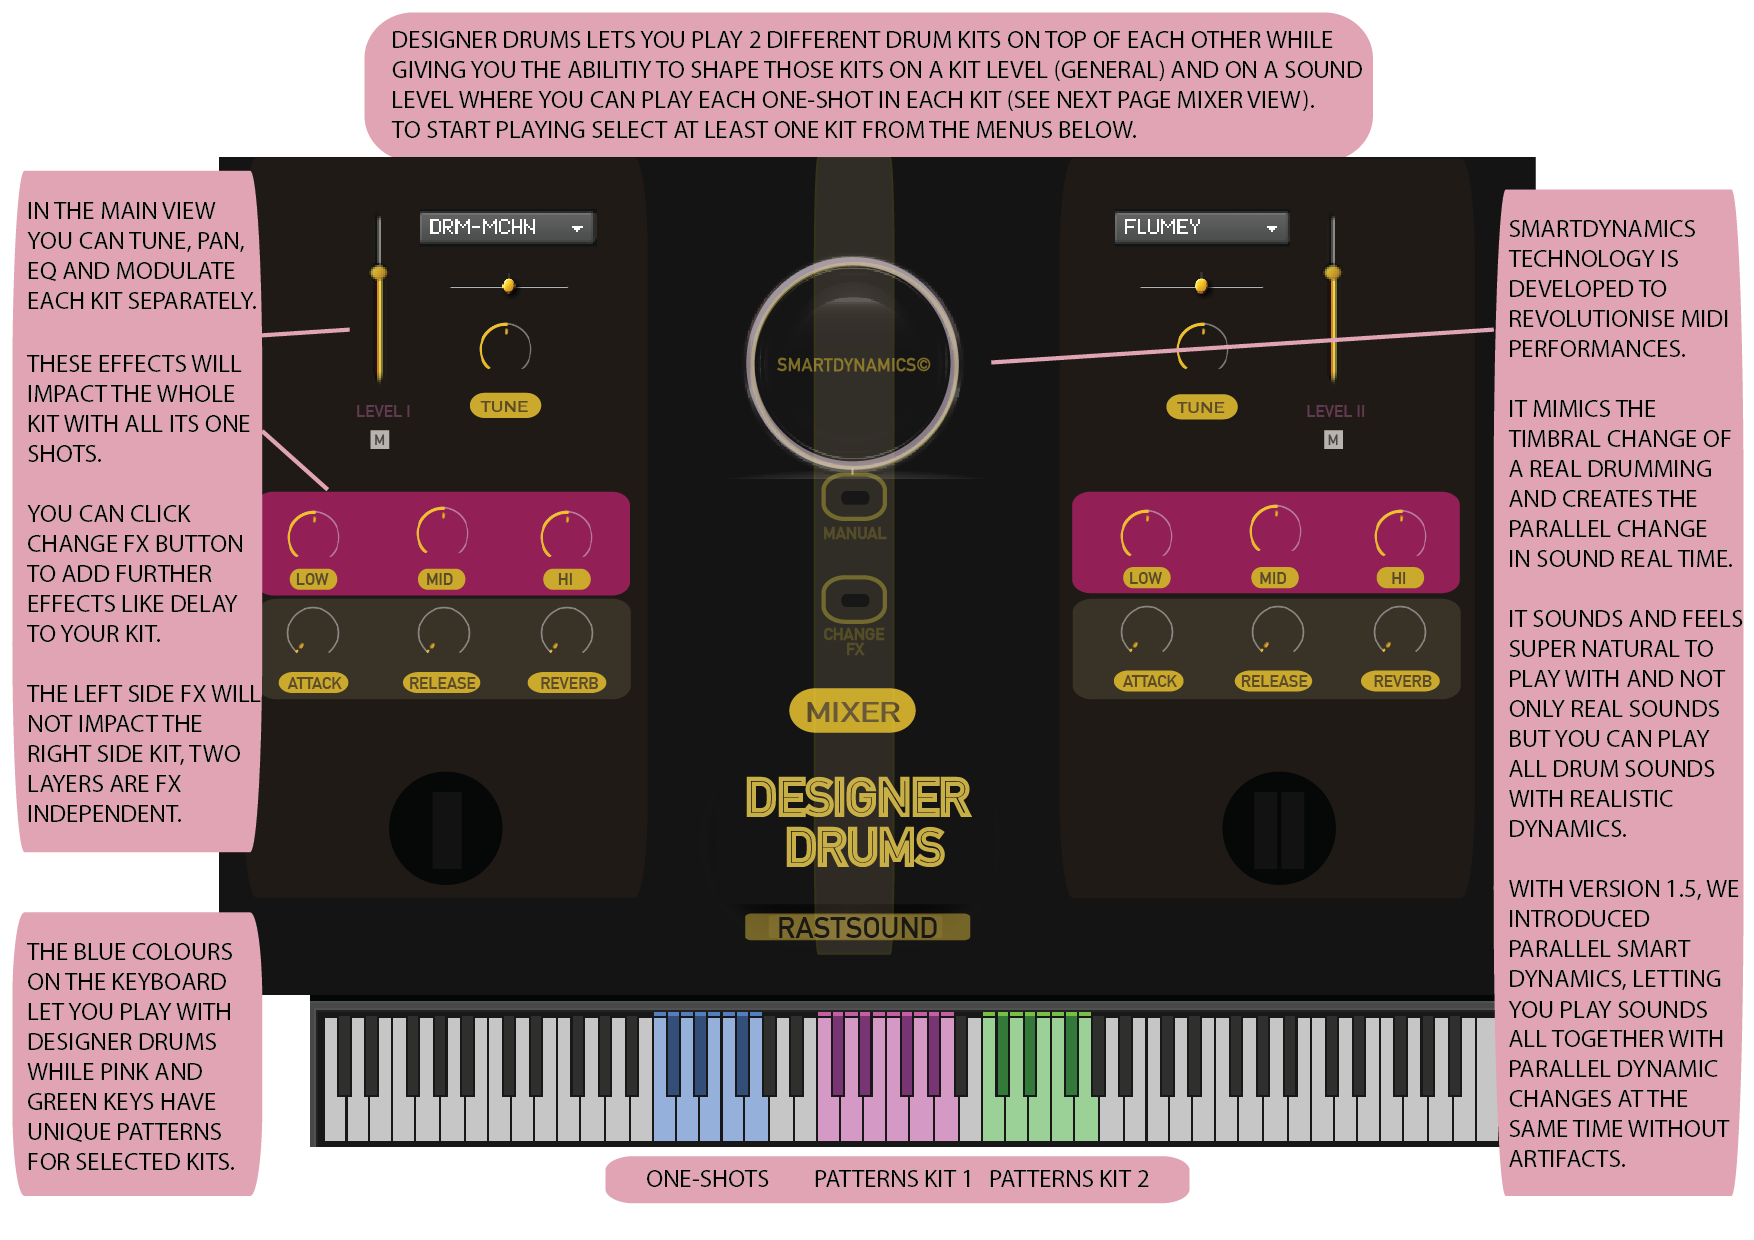 Designer Drums - Rast Sound